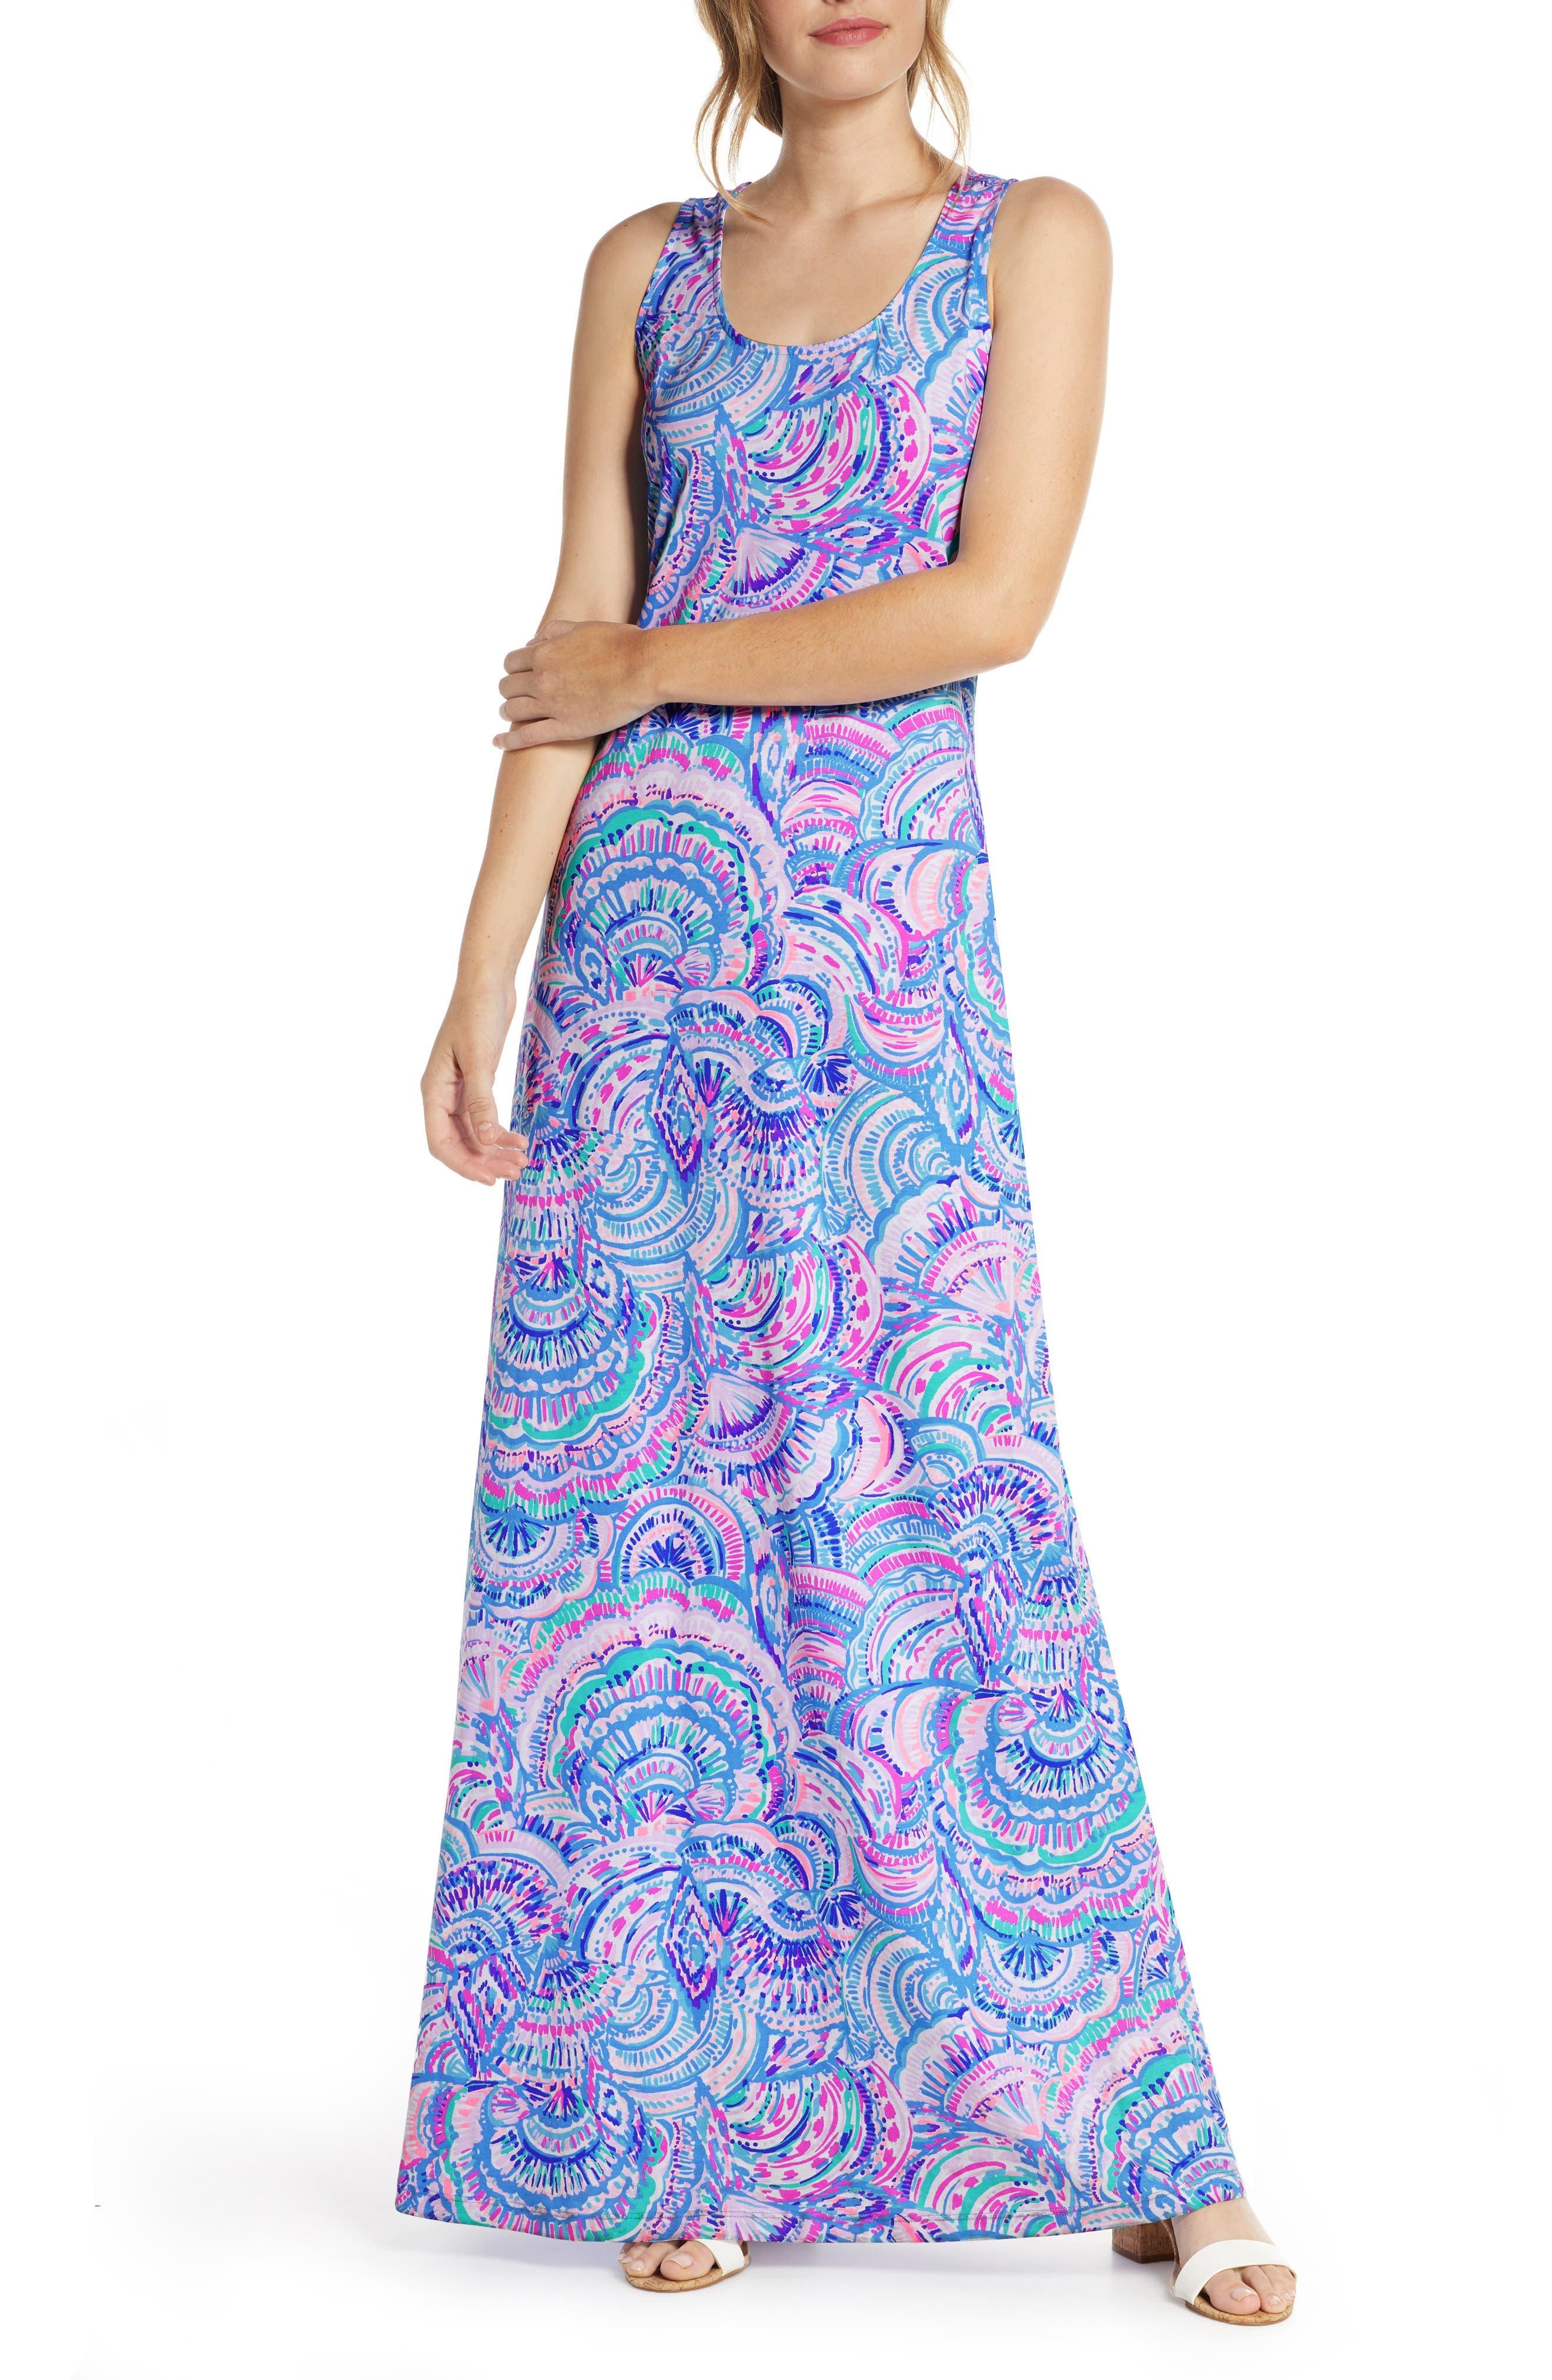 70s Dresses – Disco Dress, Hippie Dress, Wrap Dress Womens Lilly Pulitzer Treena Maxi Dress $148.00 AT vintagedancer.com